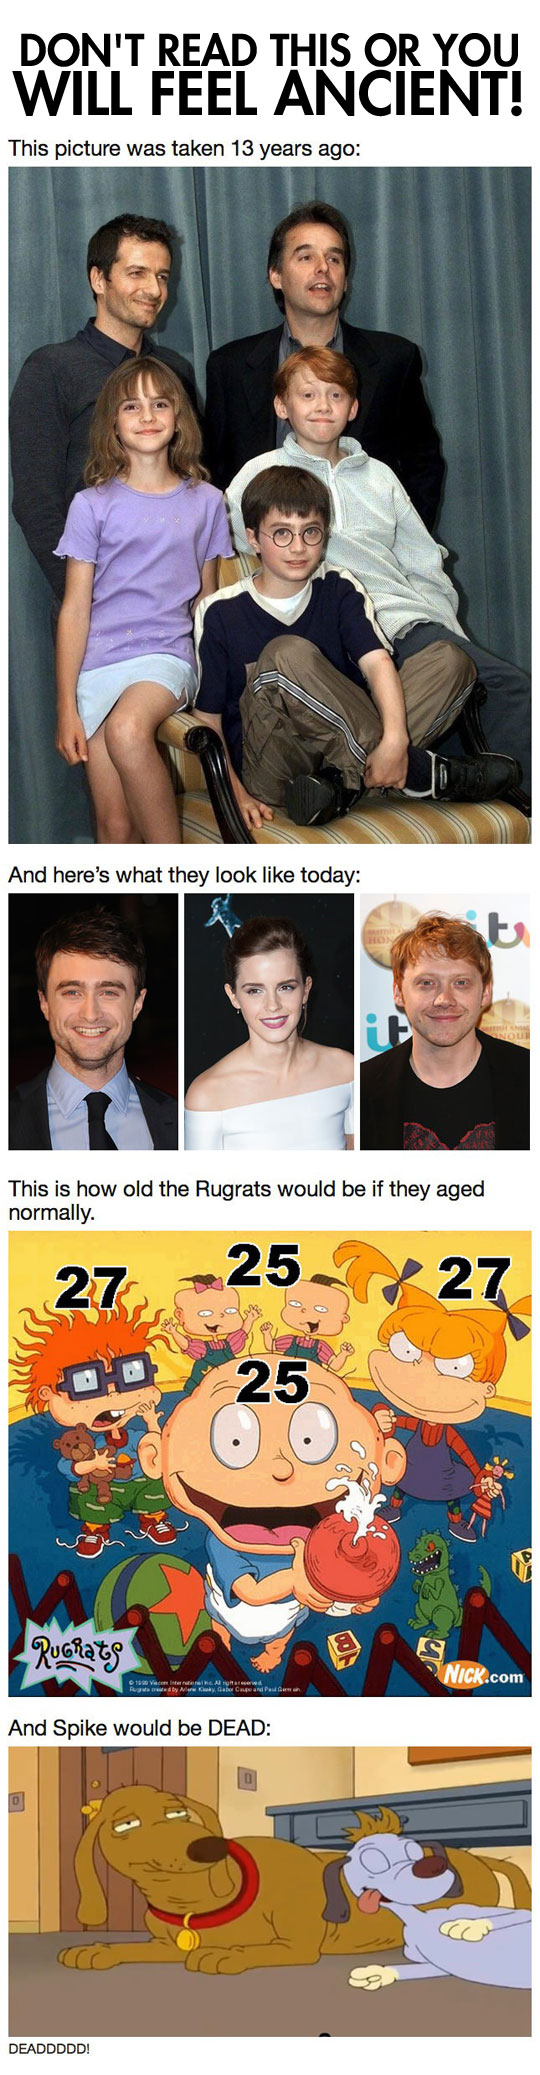 I already feel old...